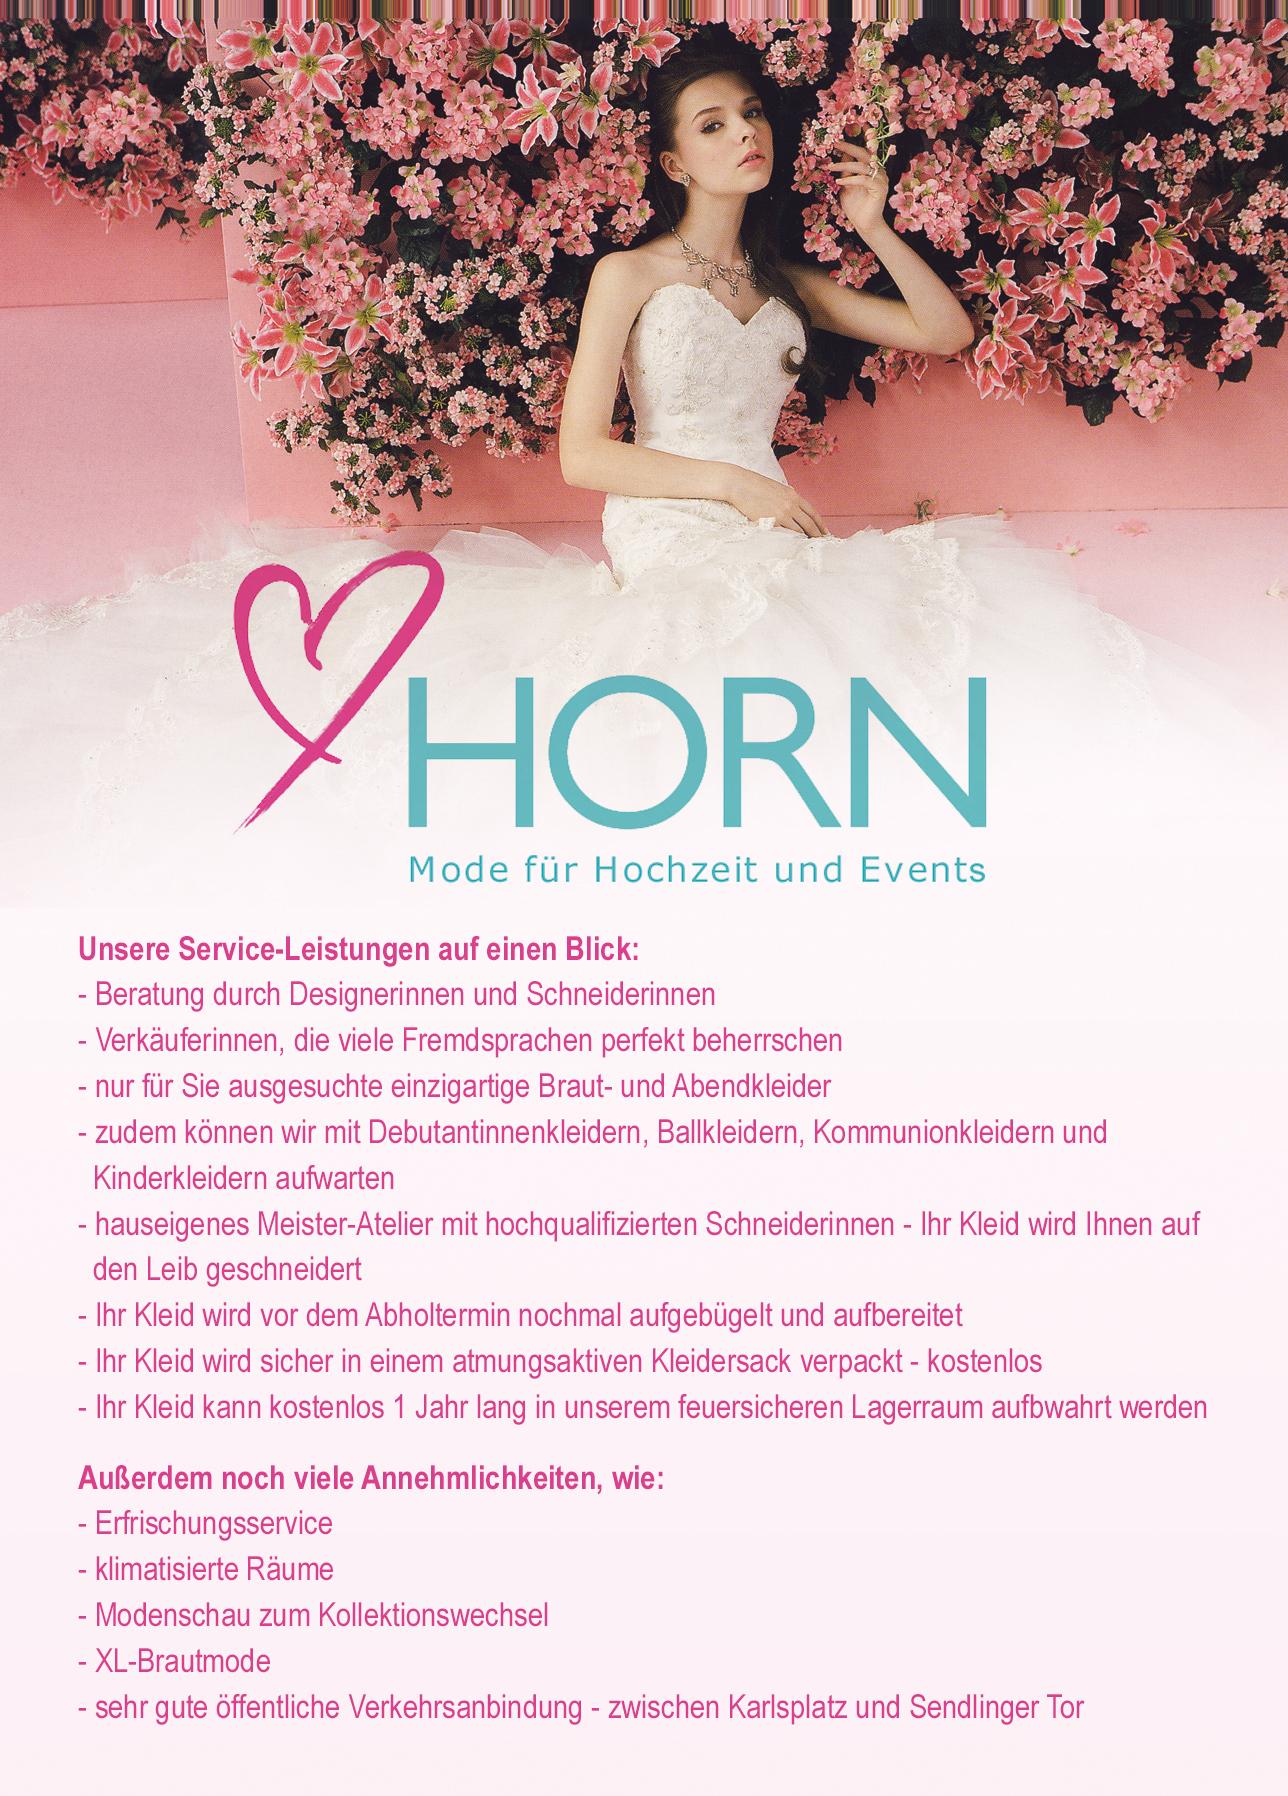 Horn Brautmode Premium Weddings